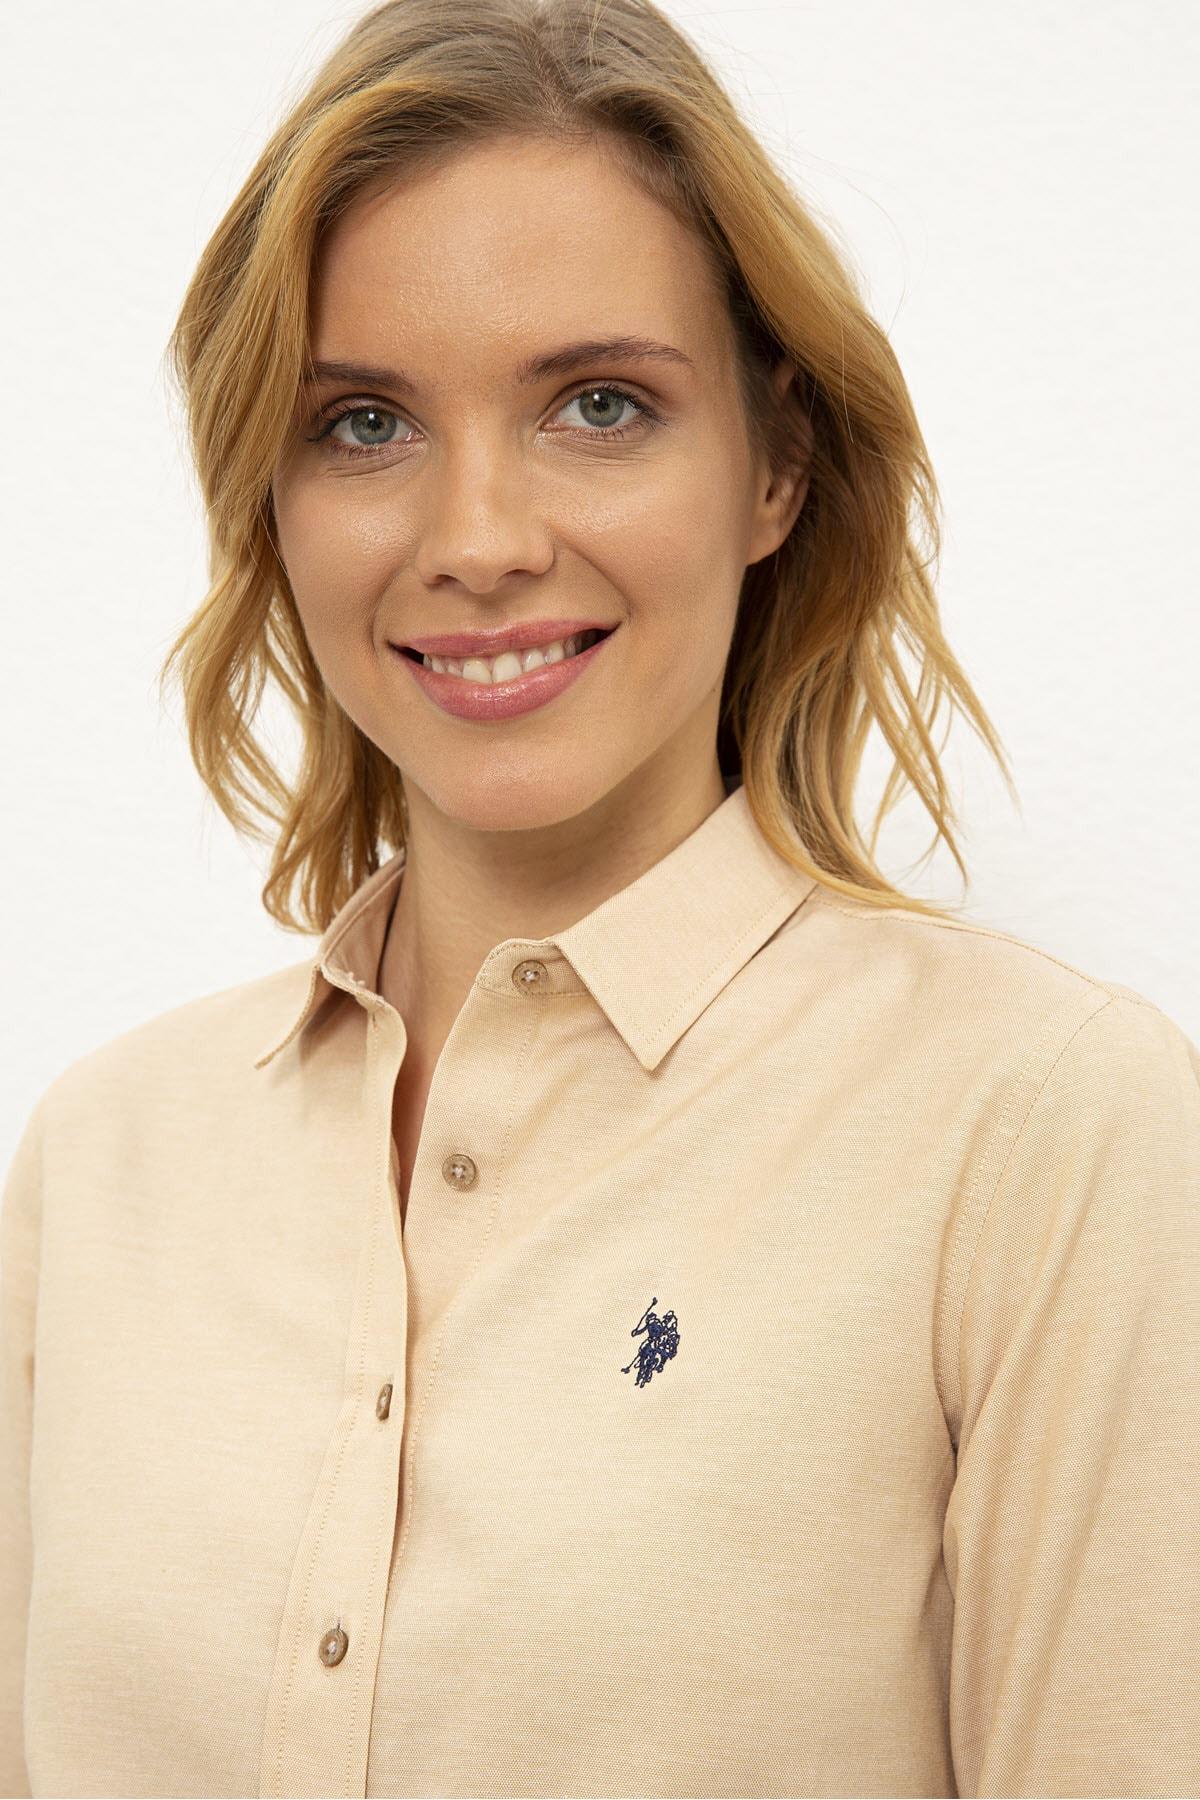 U.S. Polo Assn. Kahverengı Kadın Dokuma Gömlek G082Gl004.000.1261820 2